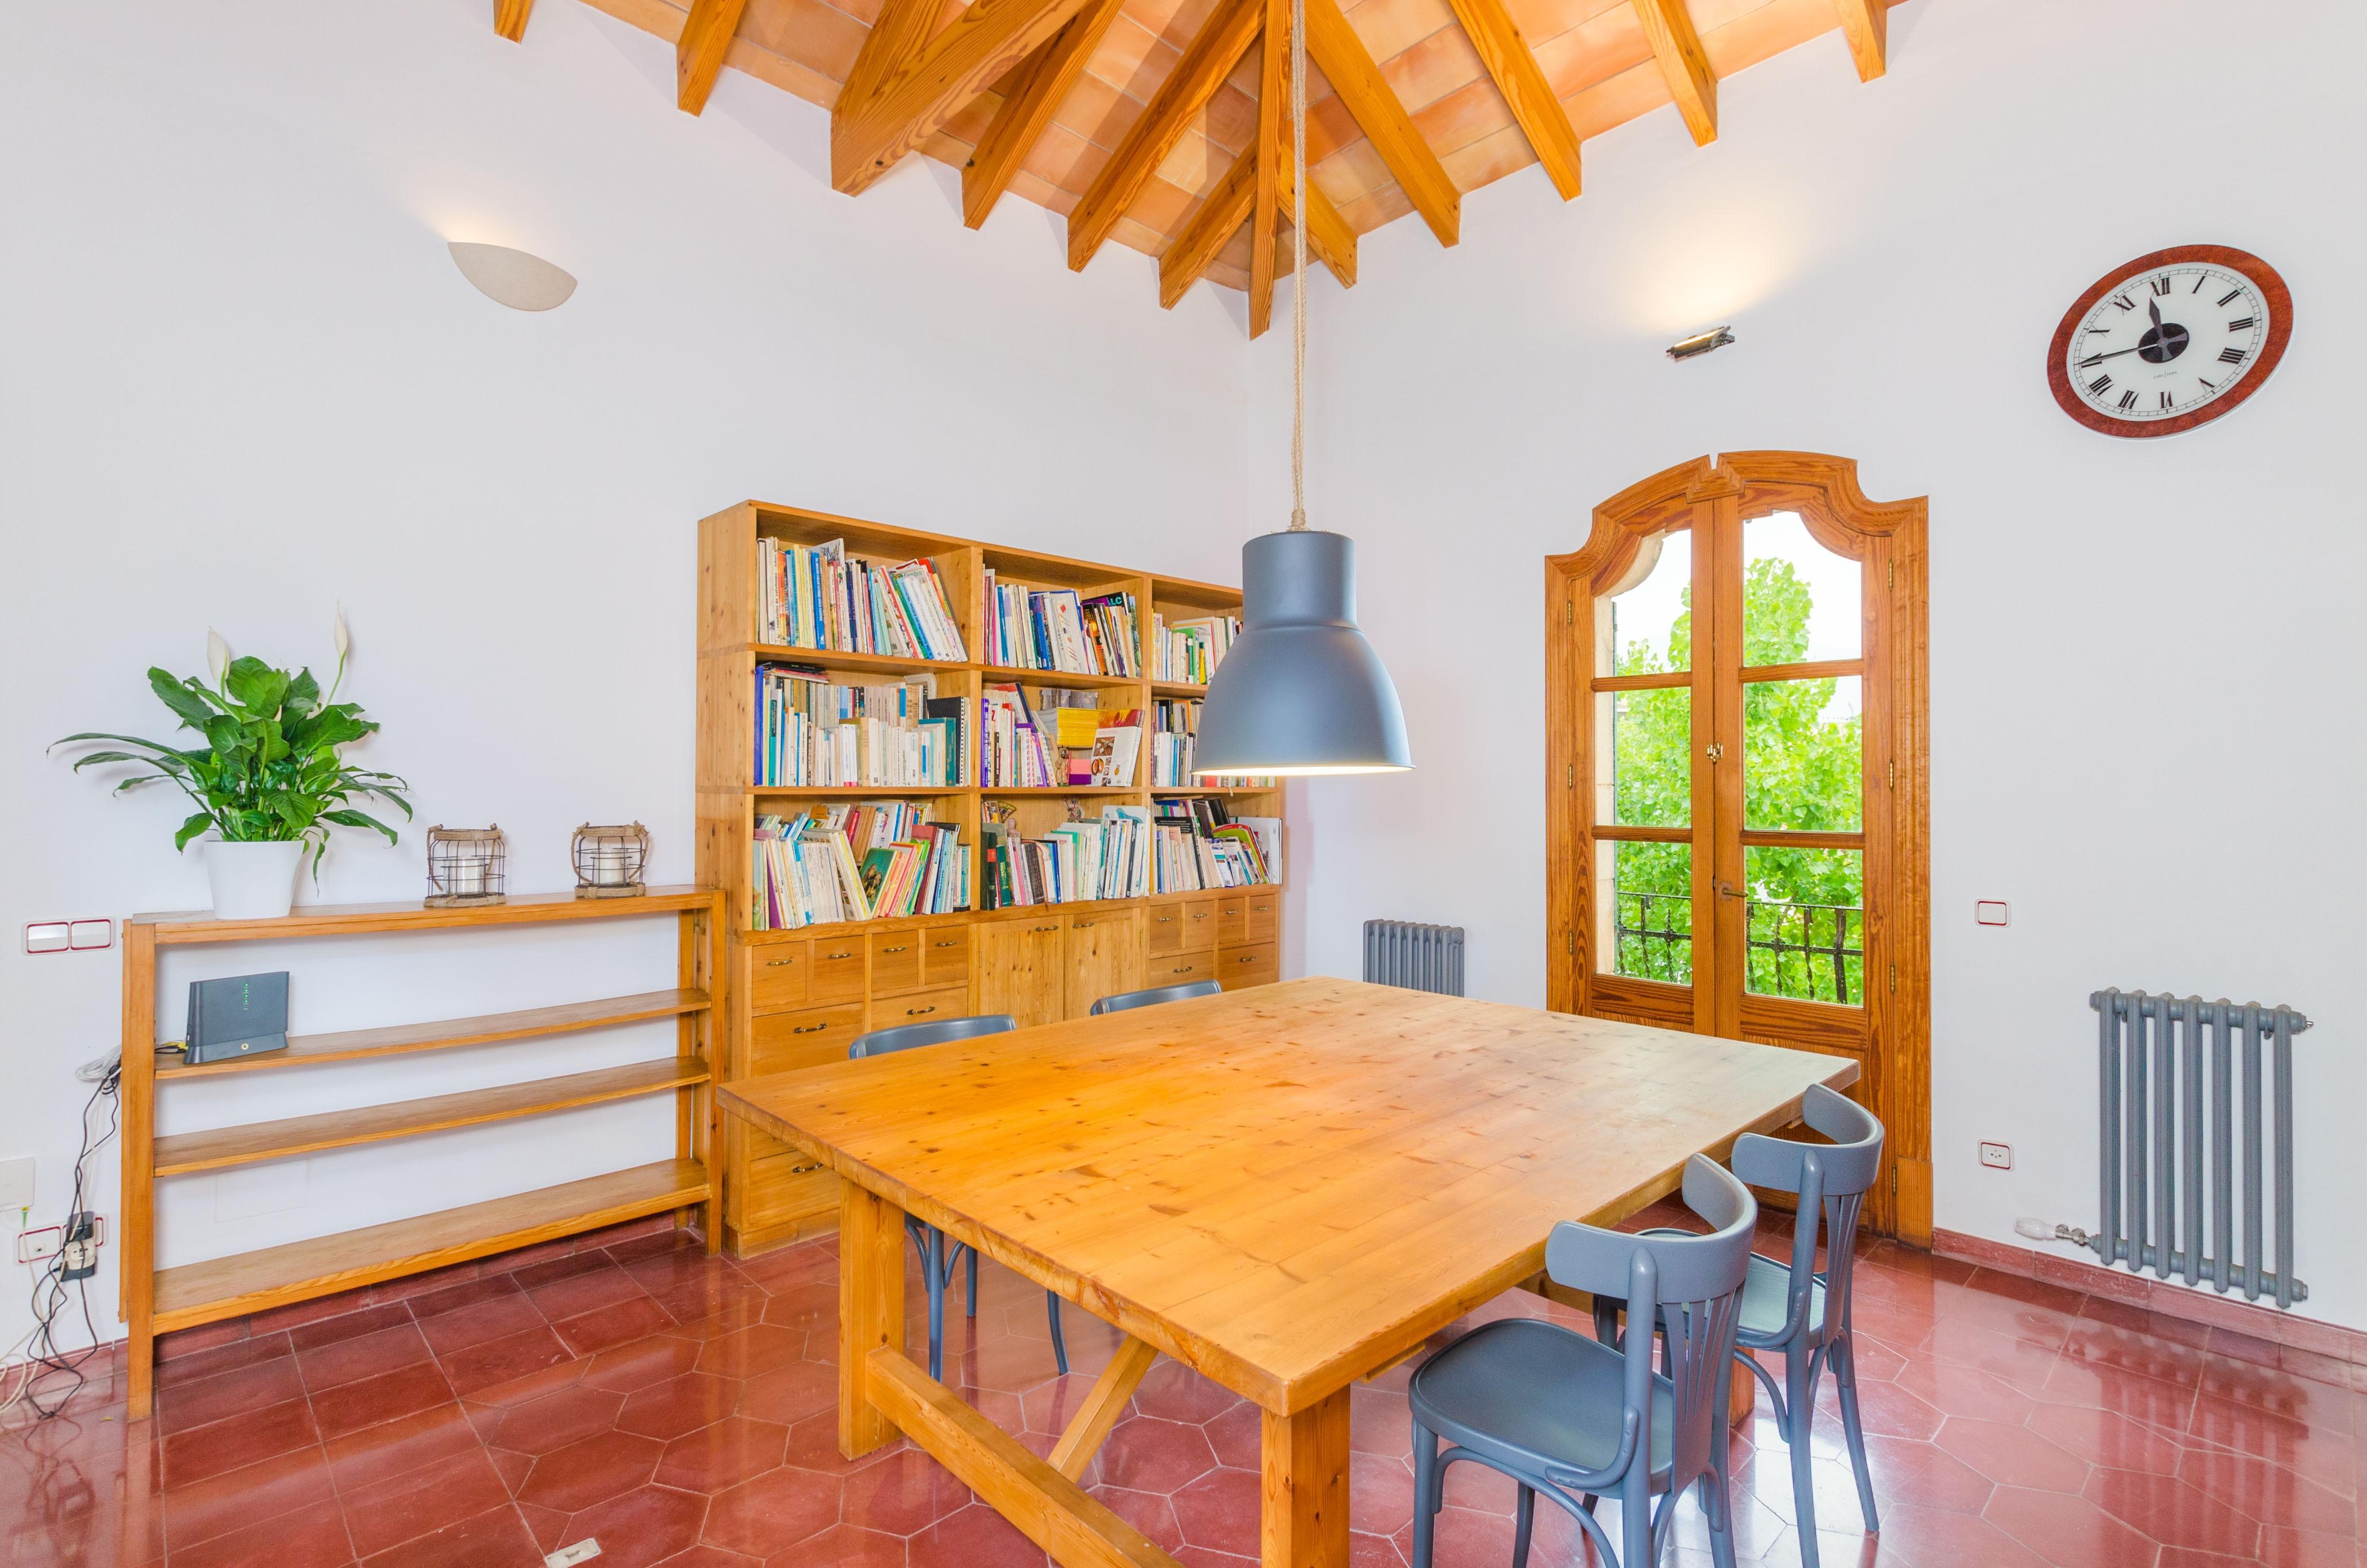 Maison de vacances CAS CONVIDATS (2435013), Alaro, Majorque, Iles Baléares, Espagne, image 42